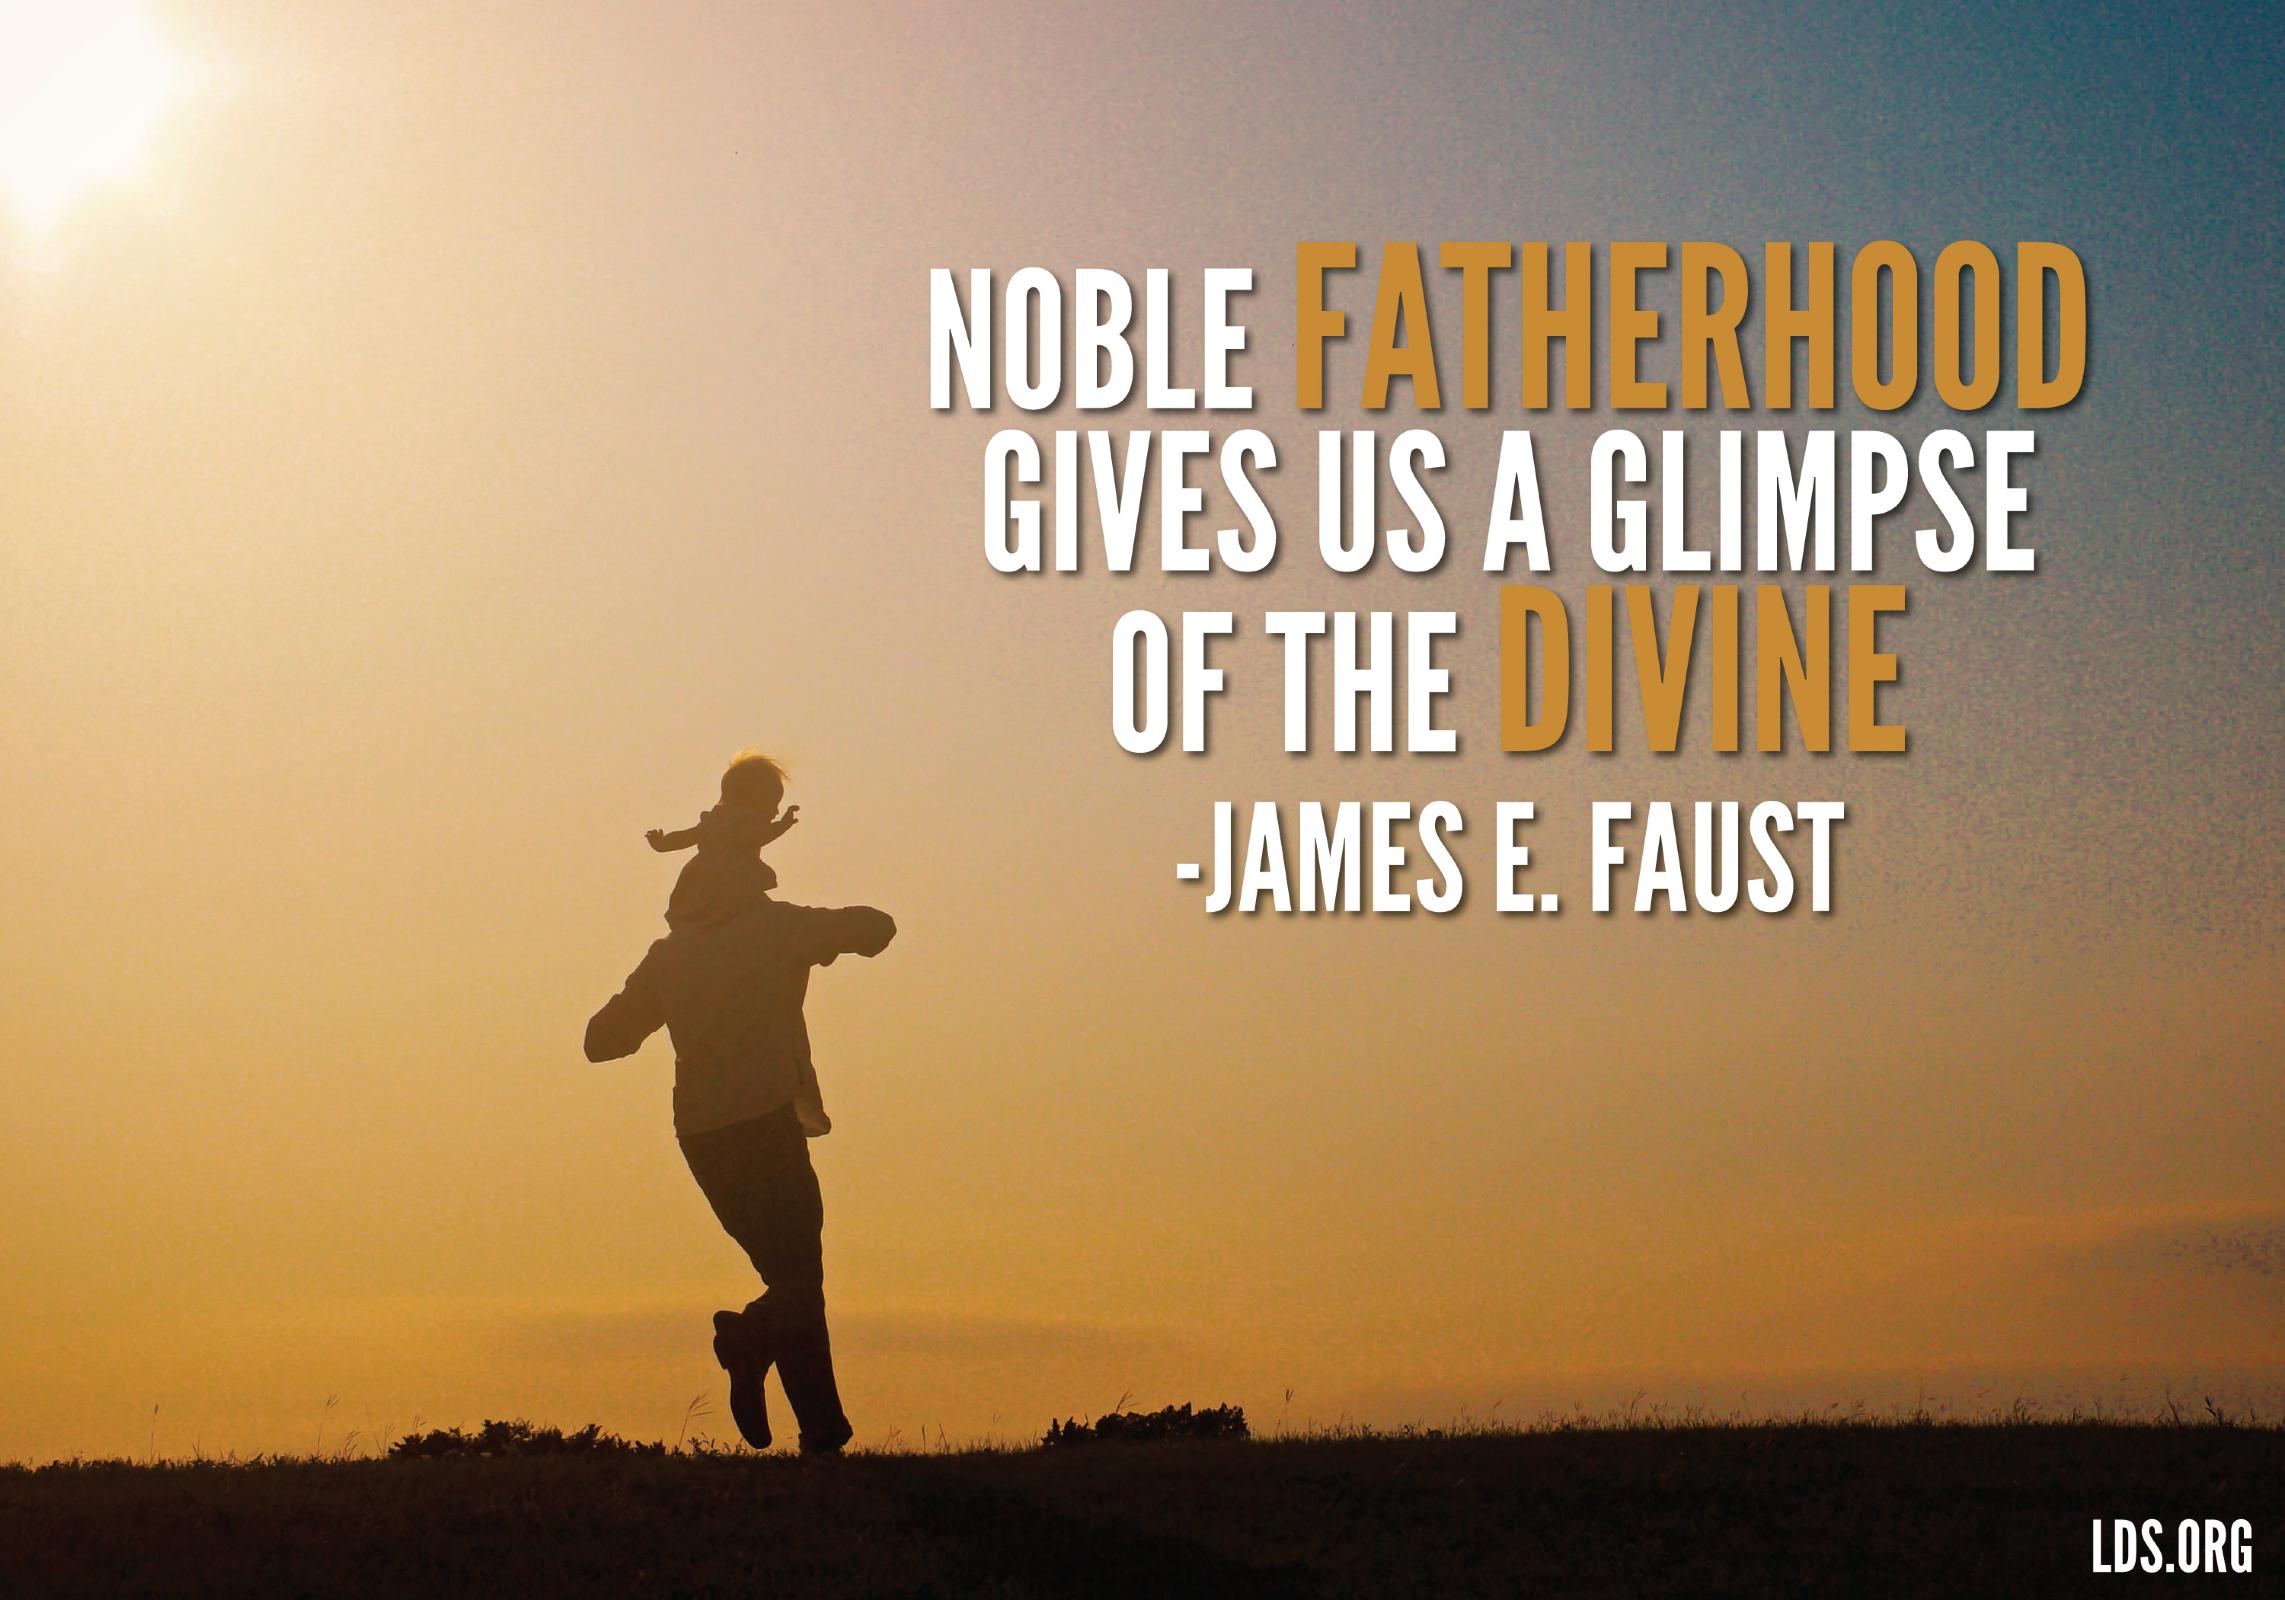 Exceptional Divine Fatherhood